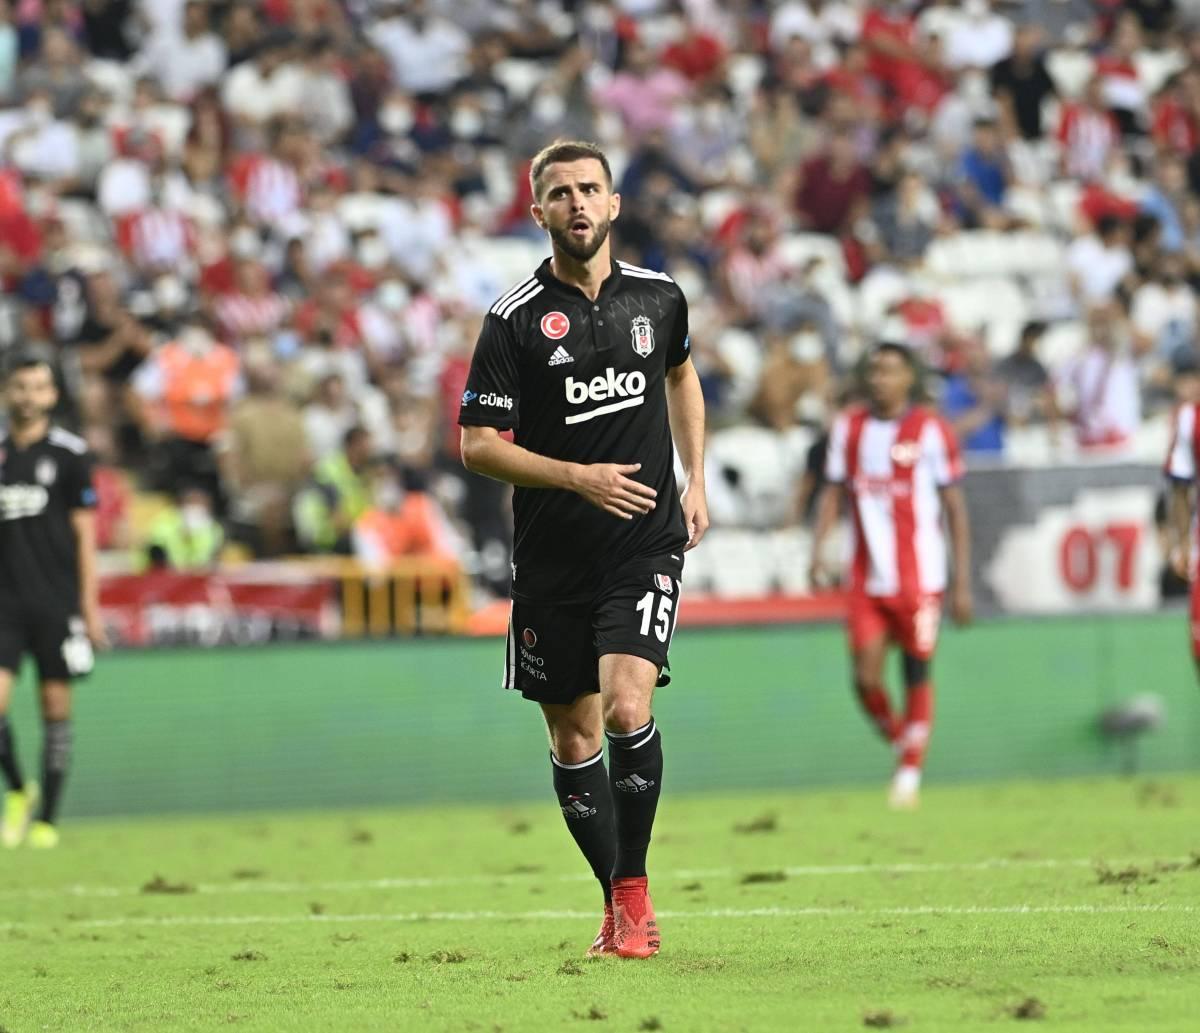 Altai – Besiktas: forecast for the Turkish Championship match